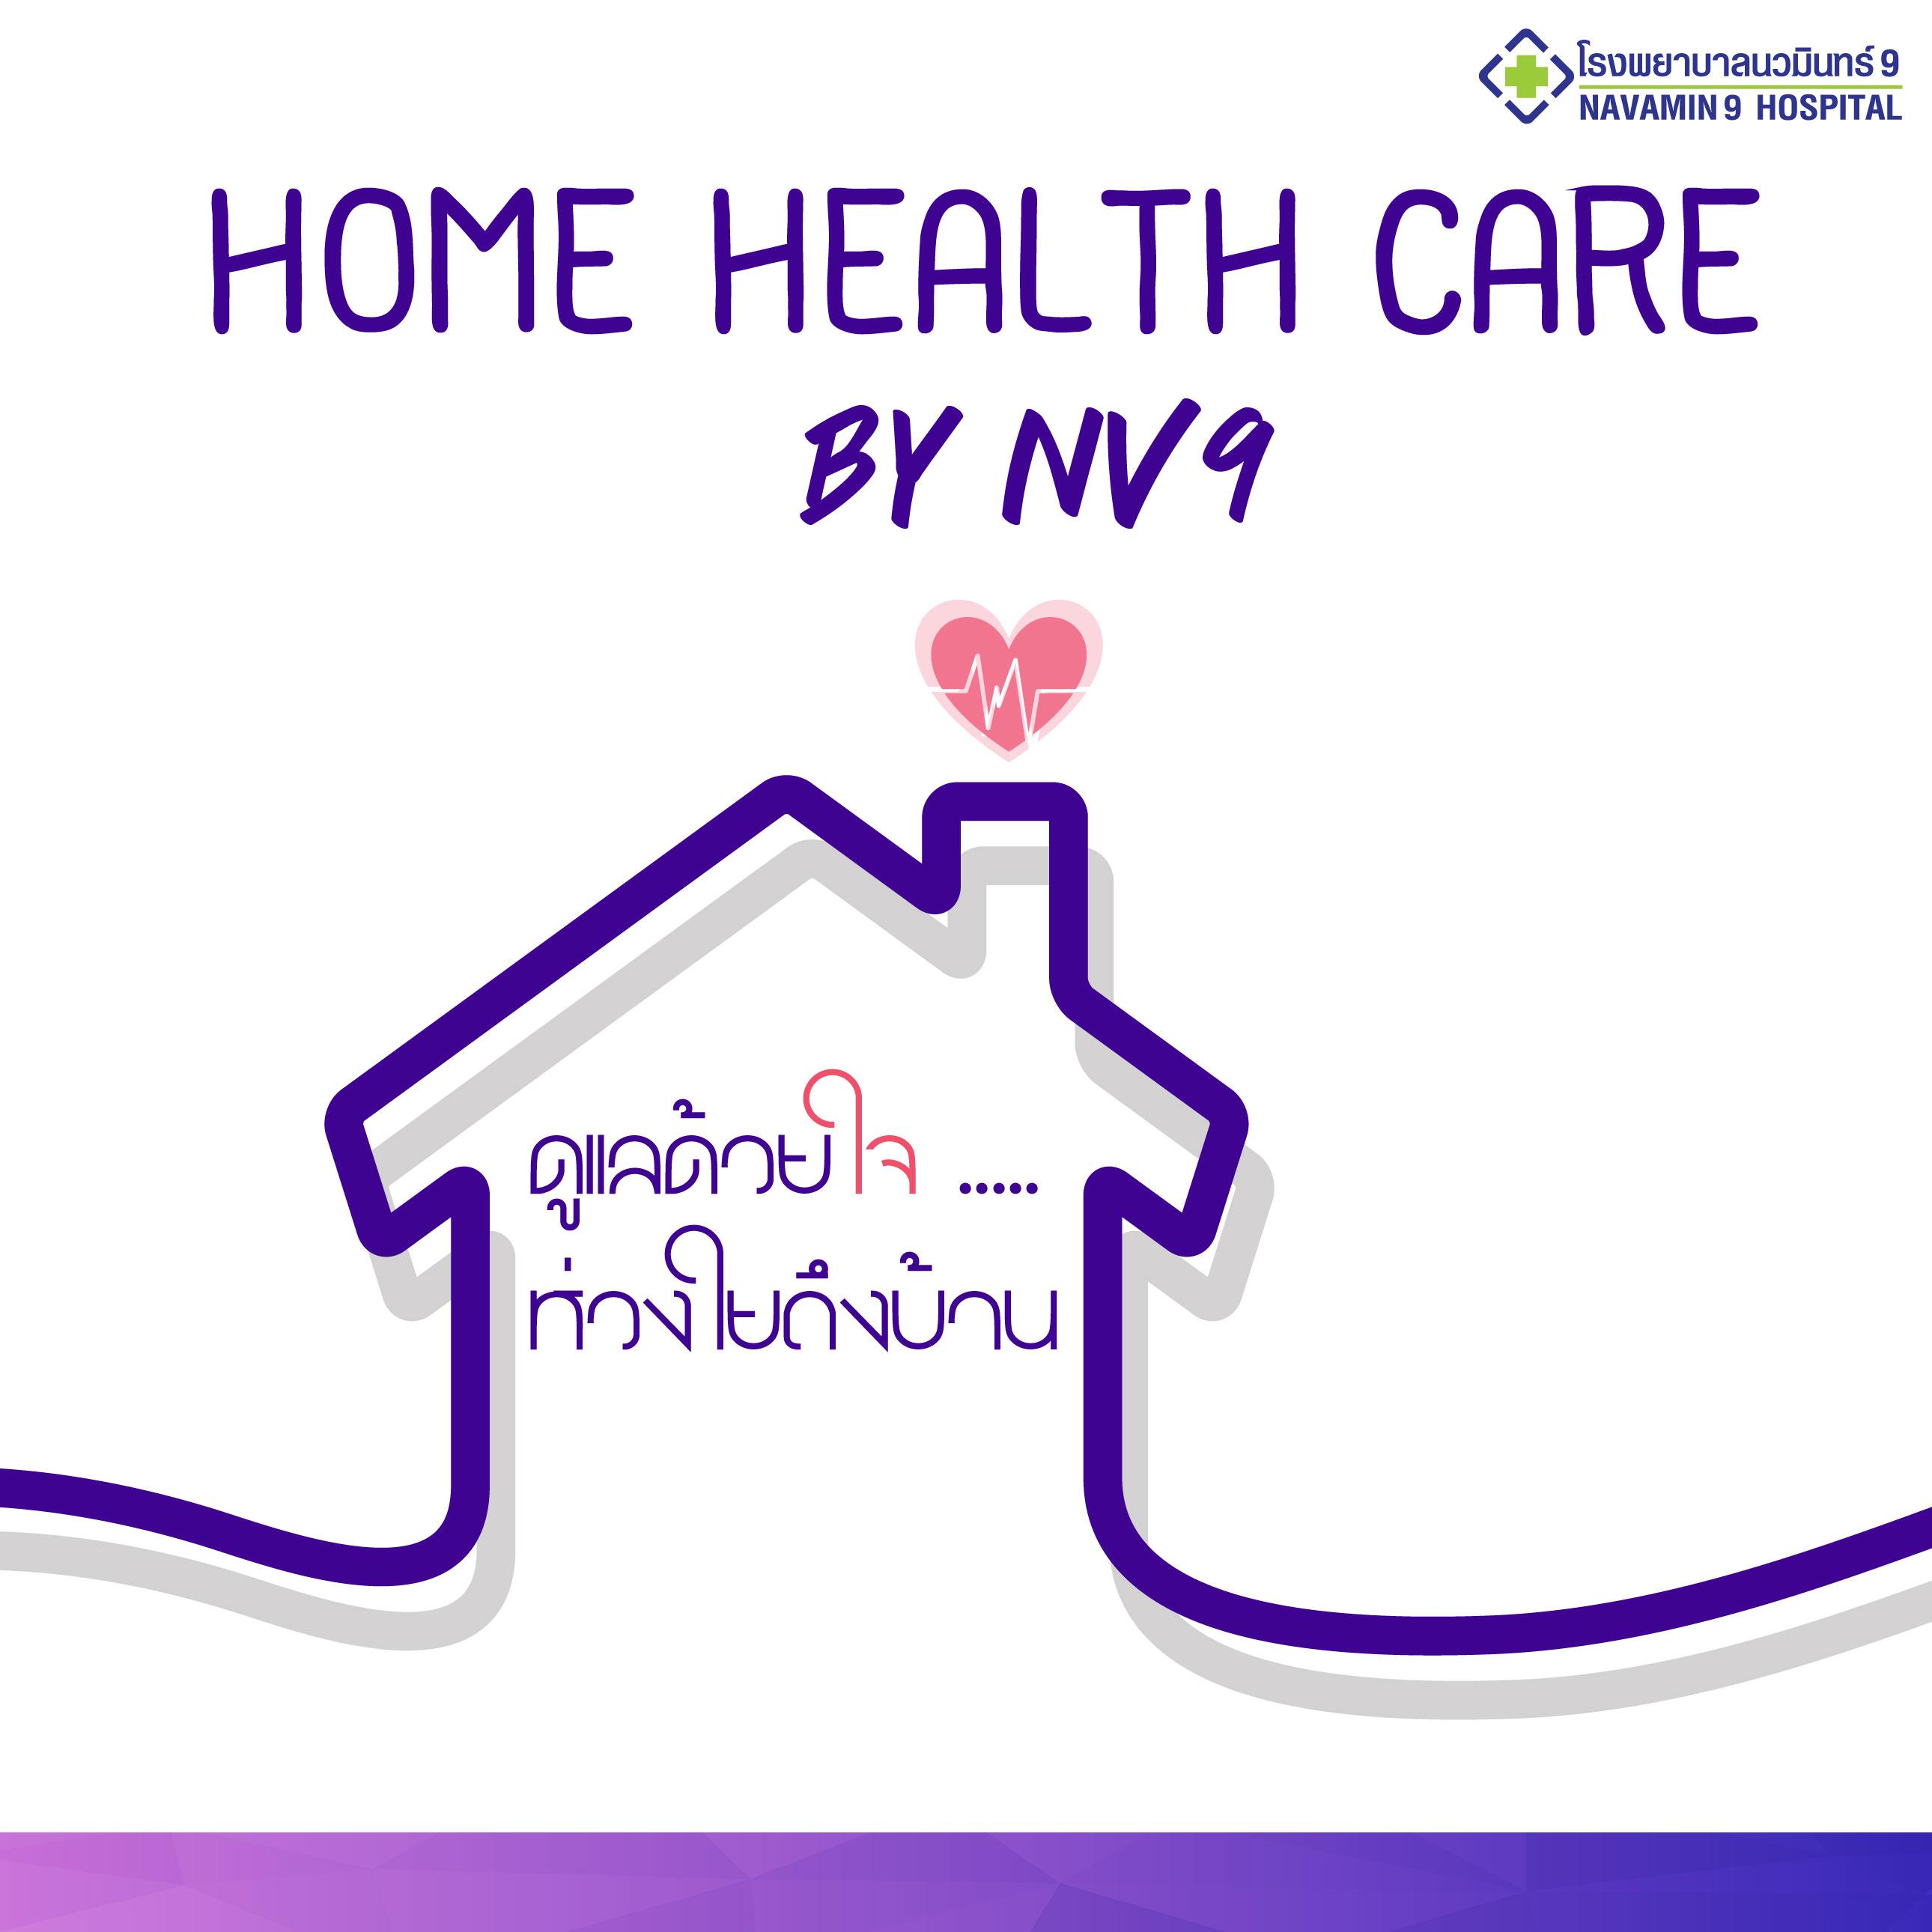 HomeHealthcare(ปกเว็บ)